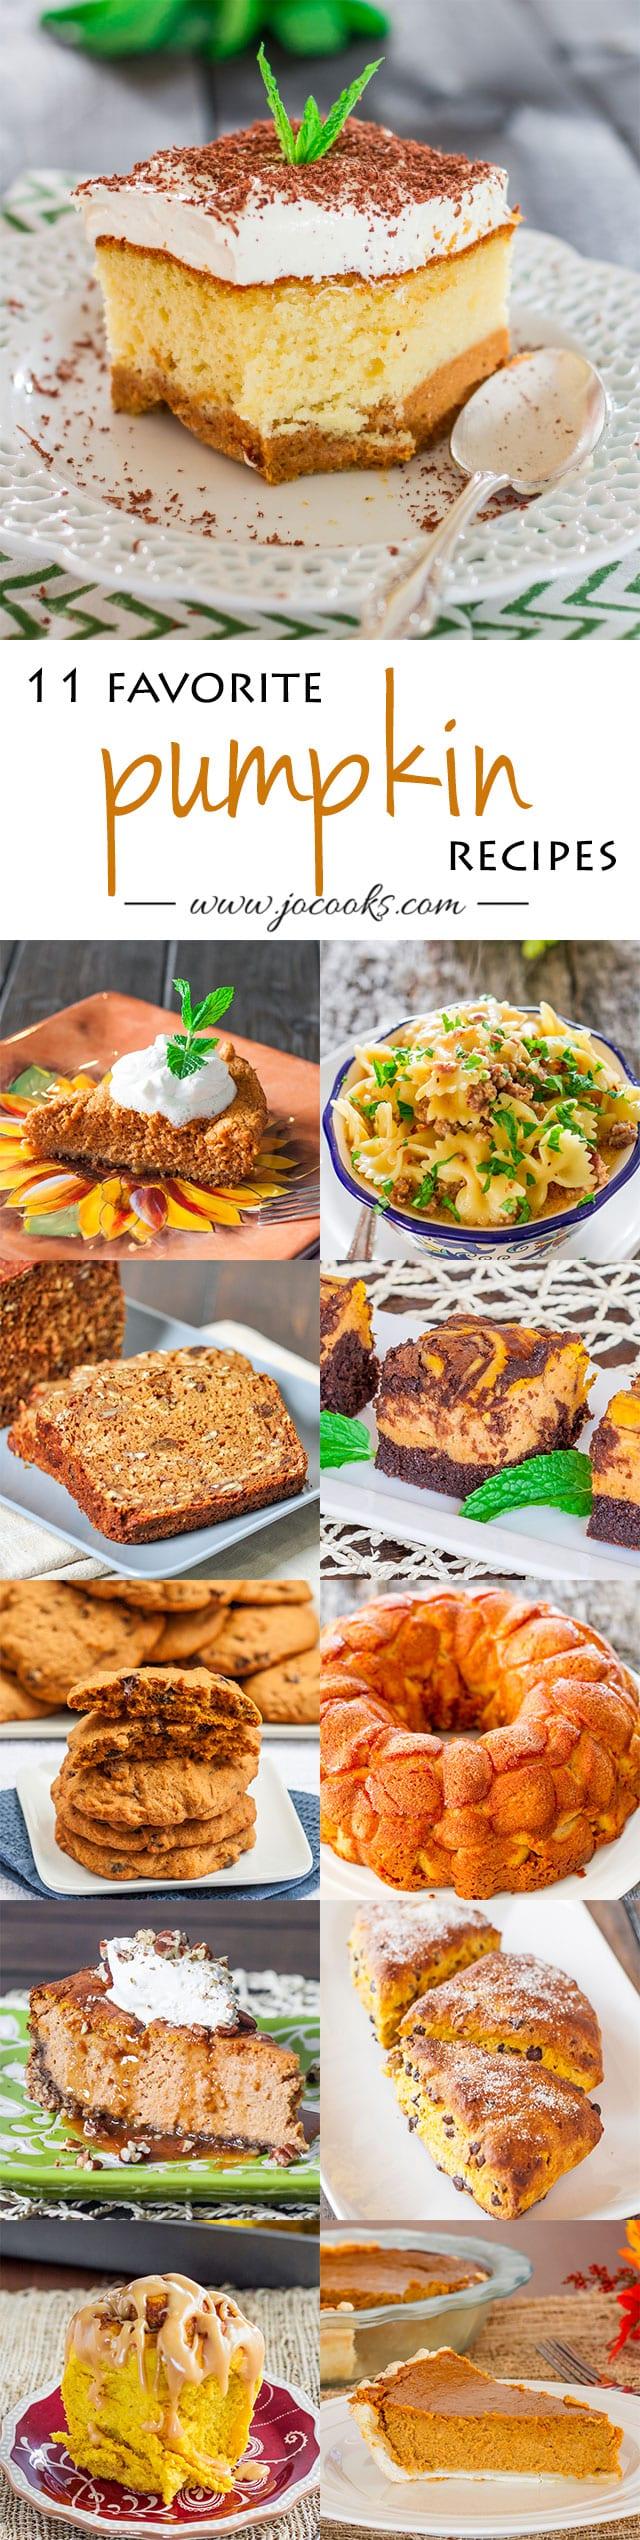 11-favorite-pumpkin-recipes-collage